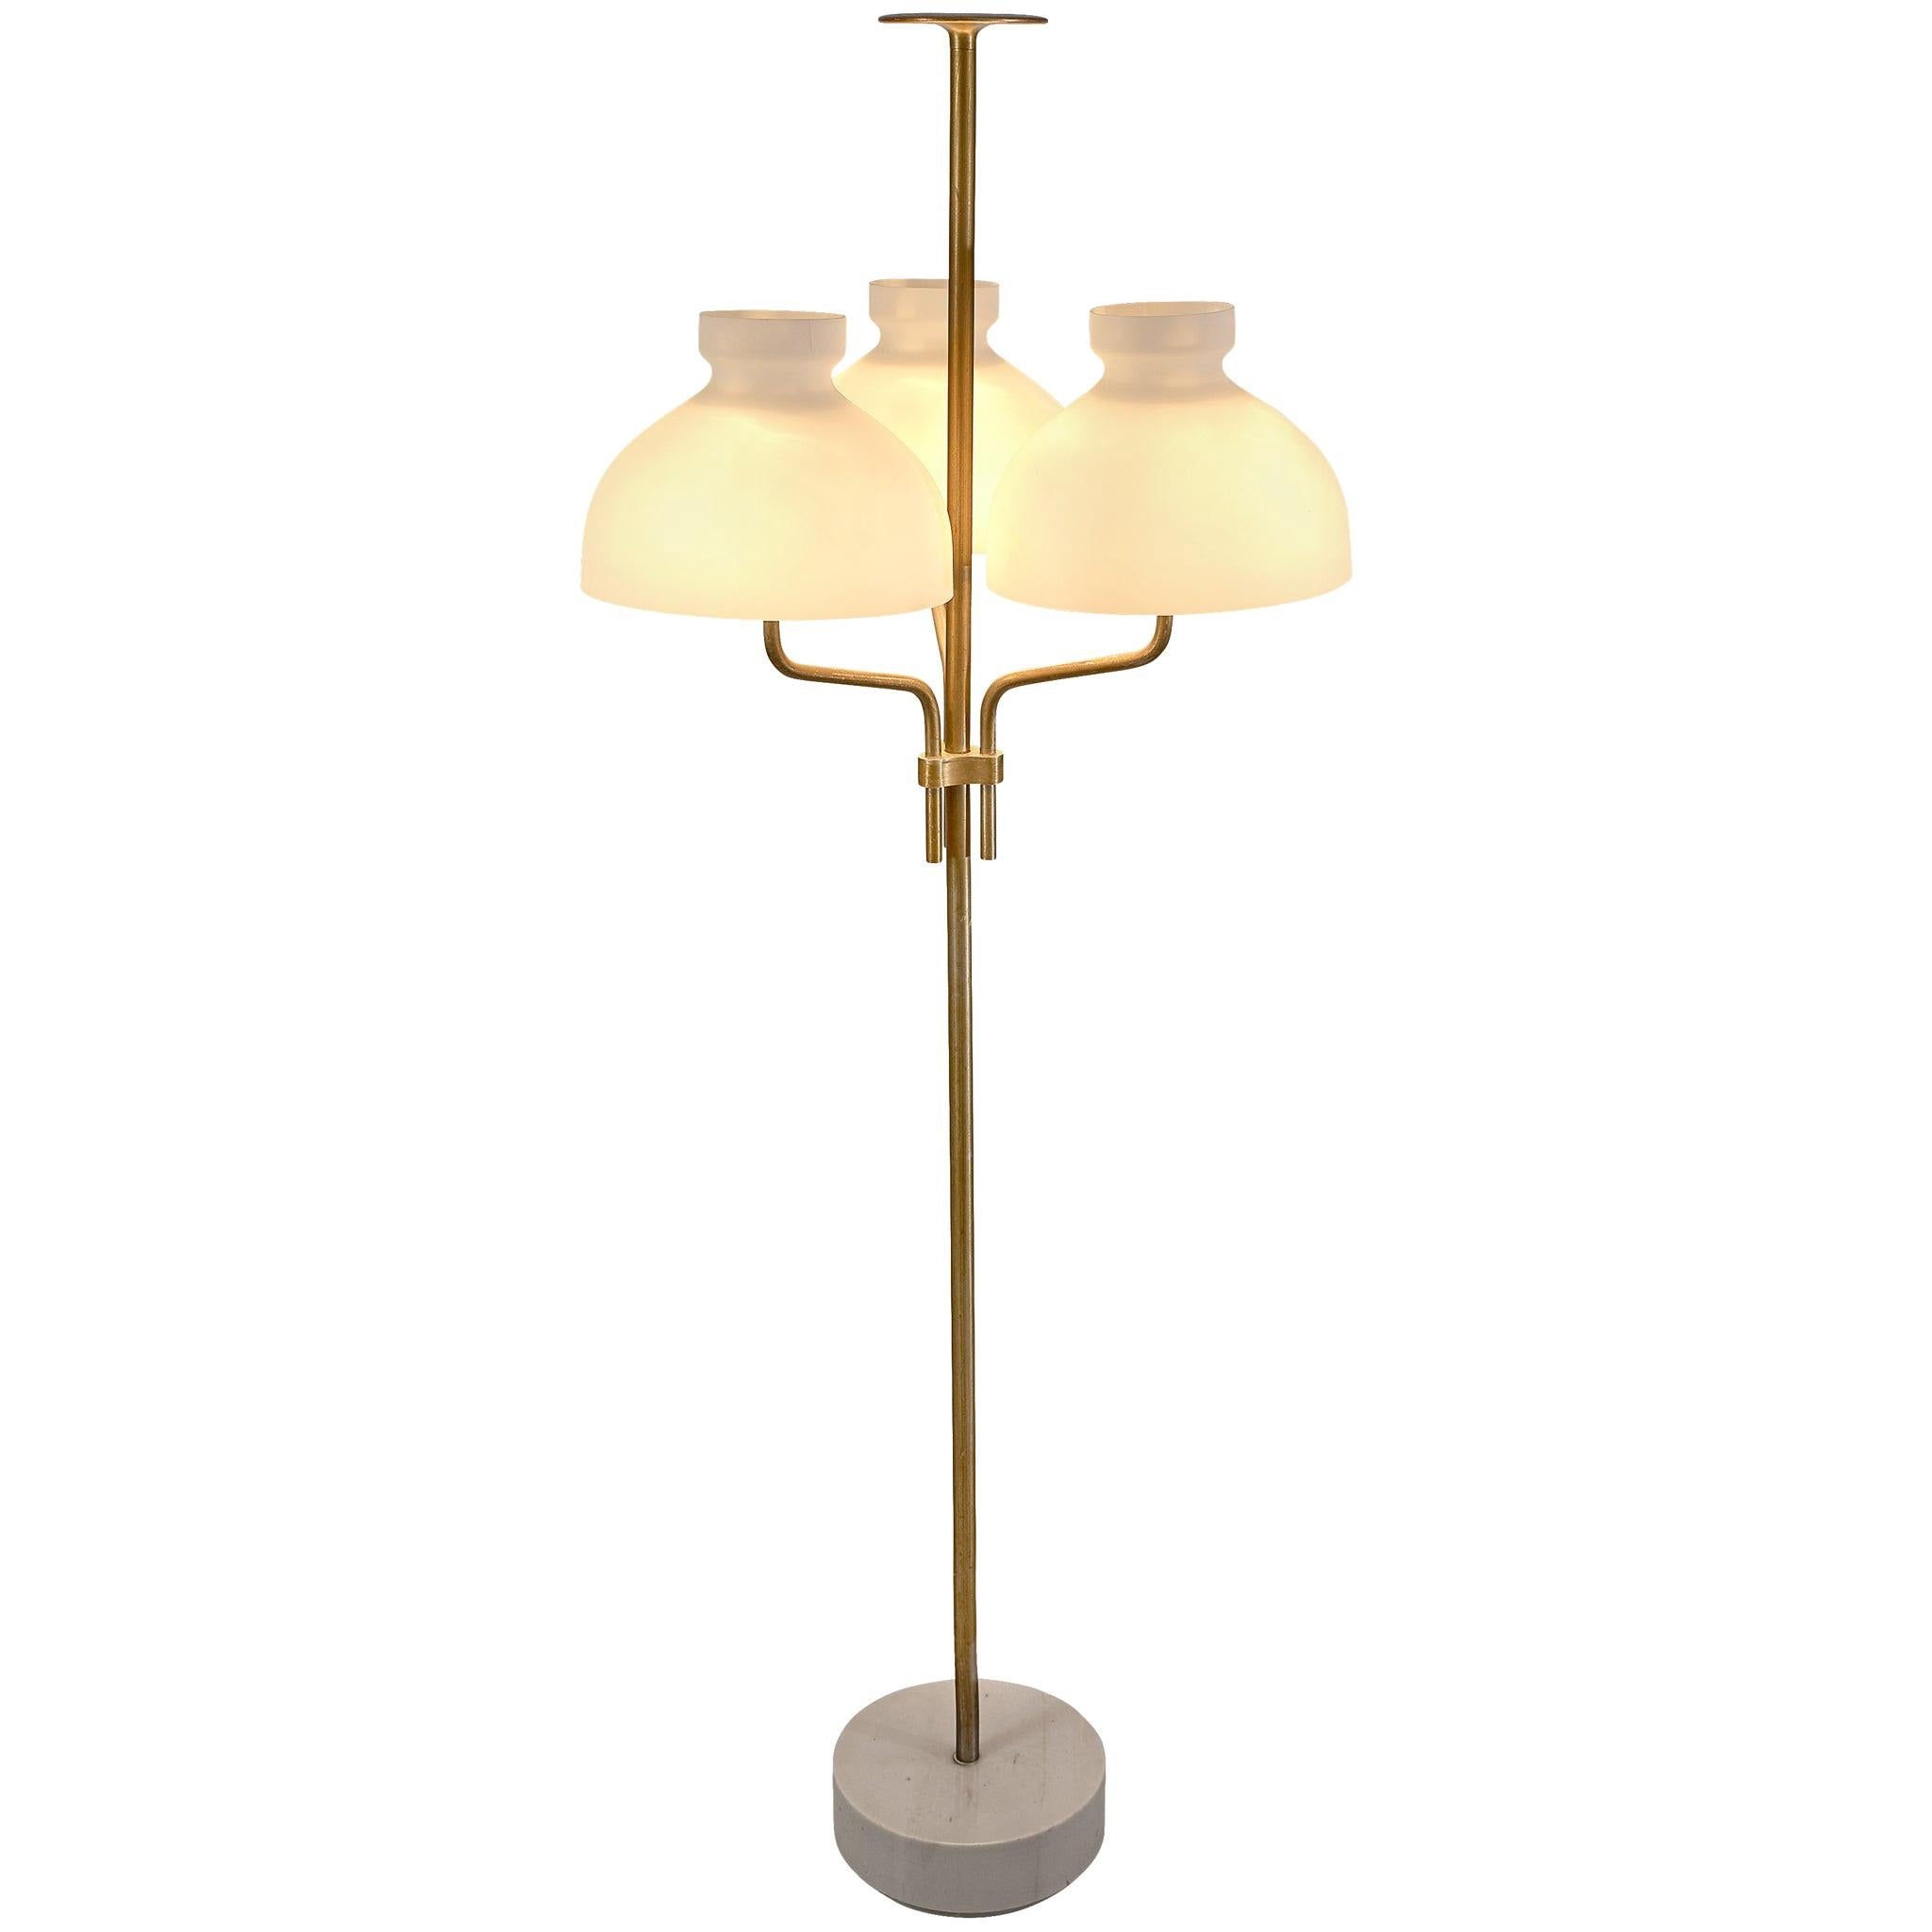 Ignazio Gardella 'Arenzano' Floor Lamp in Brass and Opaline Glass